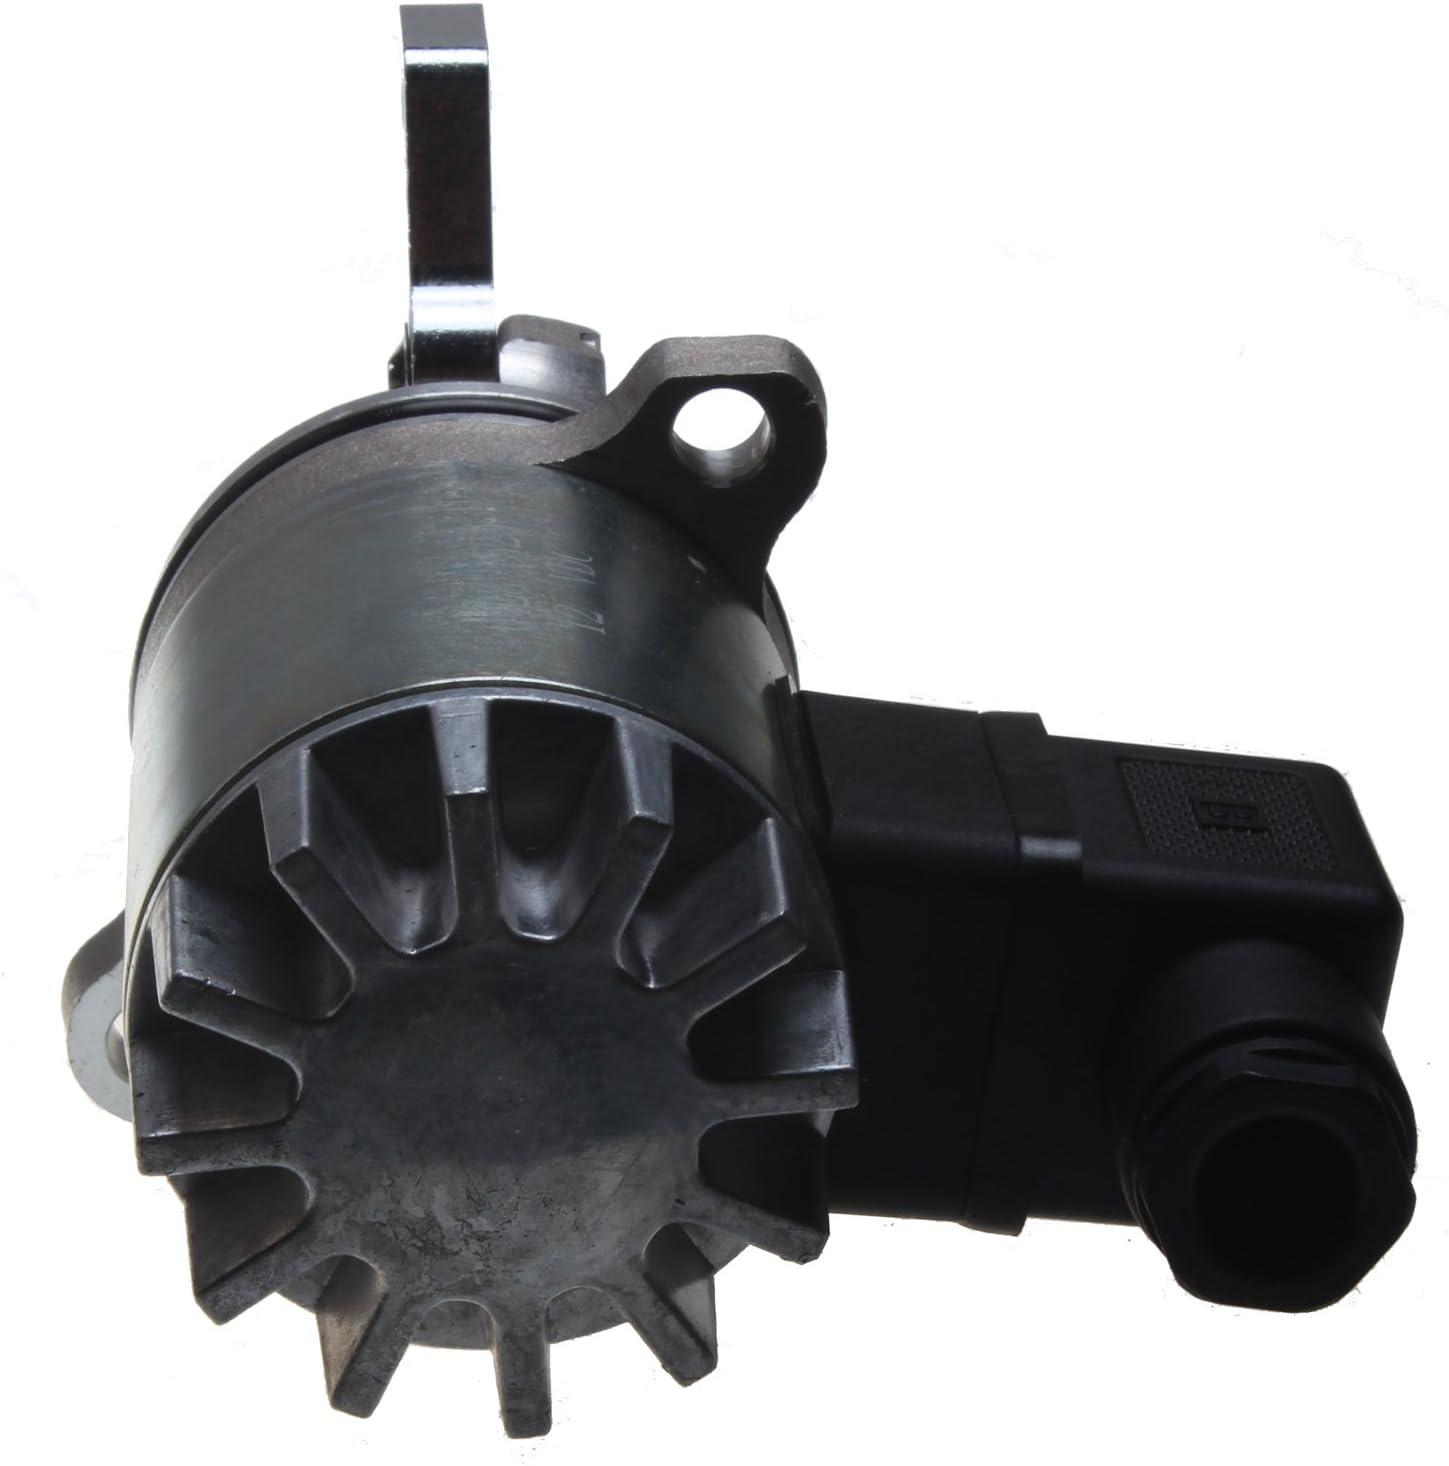 Friday Part 12V Fuel Shutoff Soleniod 0428 1525 04281525 for Deutz Engine F4L2011 F3M2011 BF4M2011 F4M2011 F3M1011 F4M1011